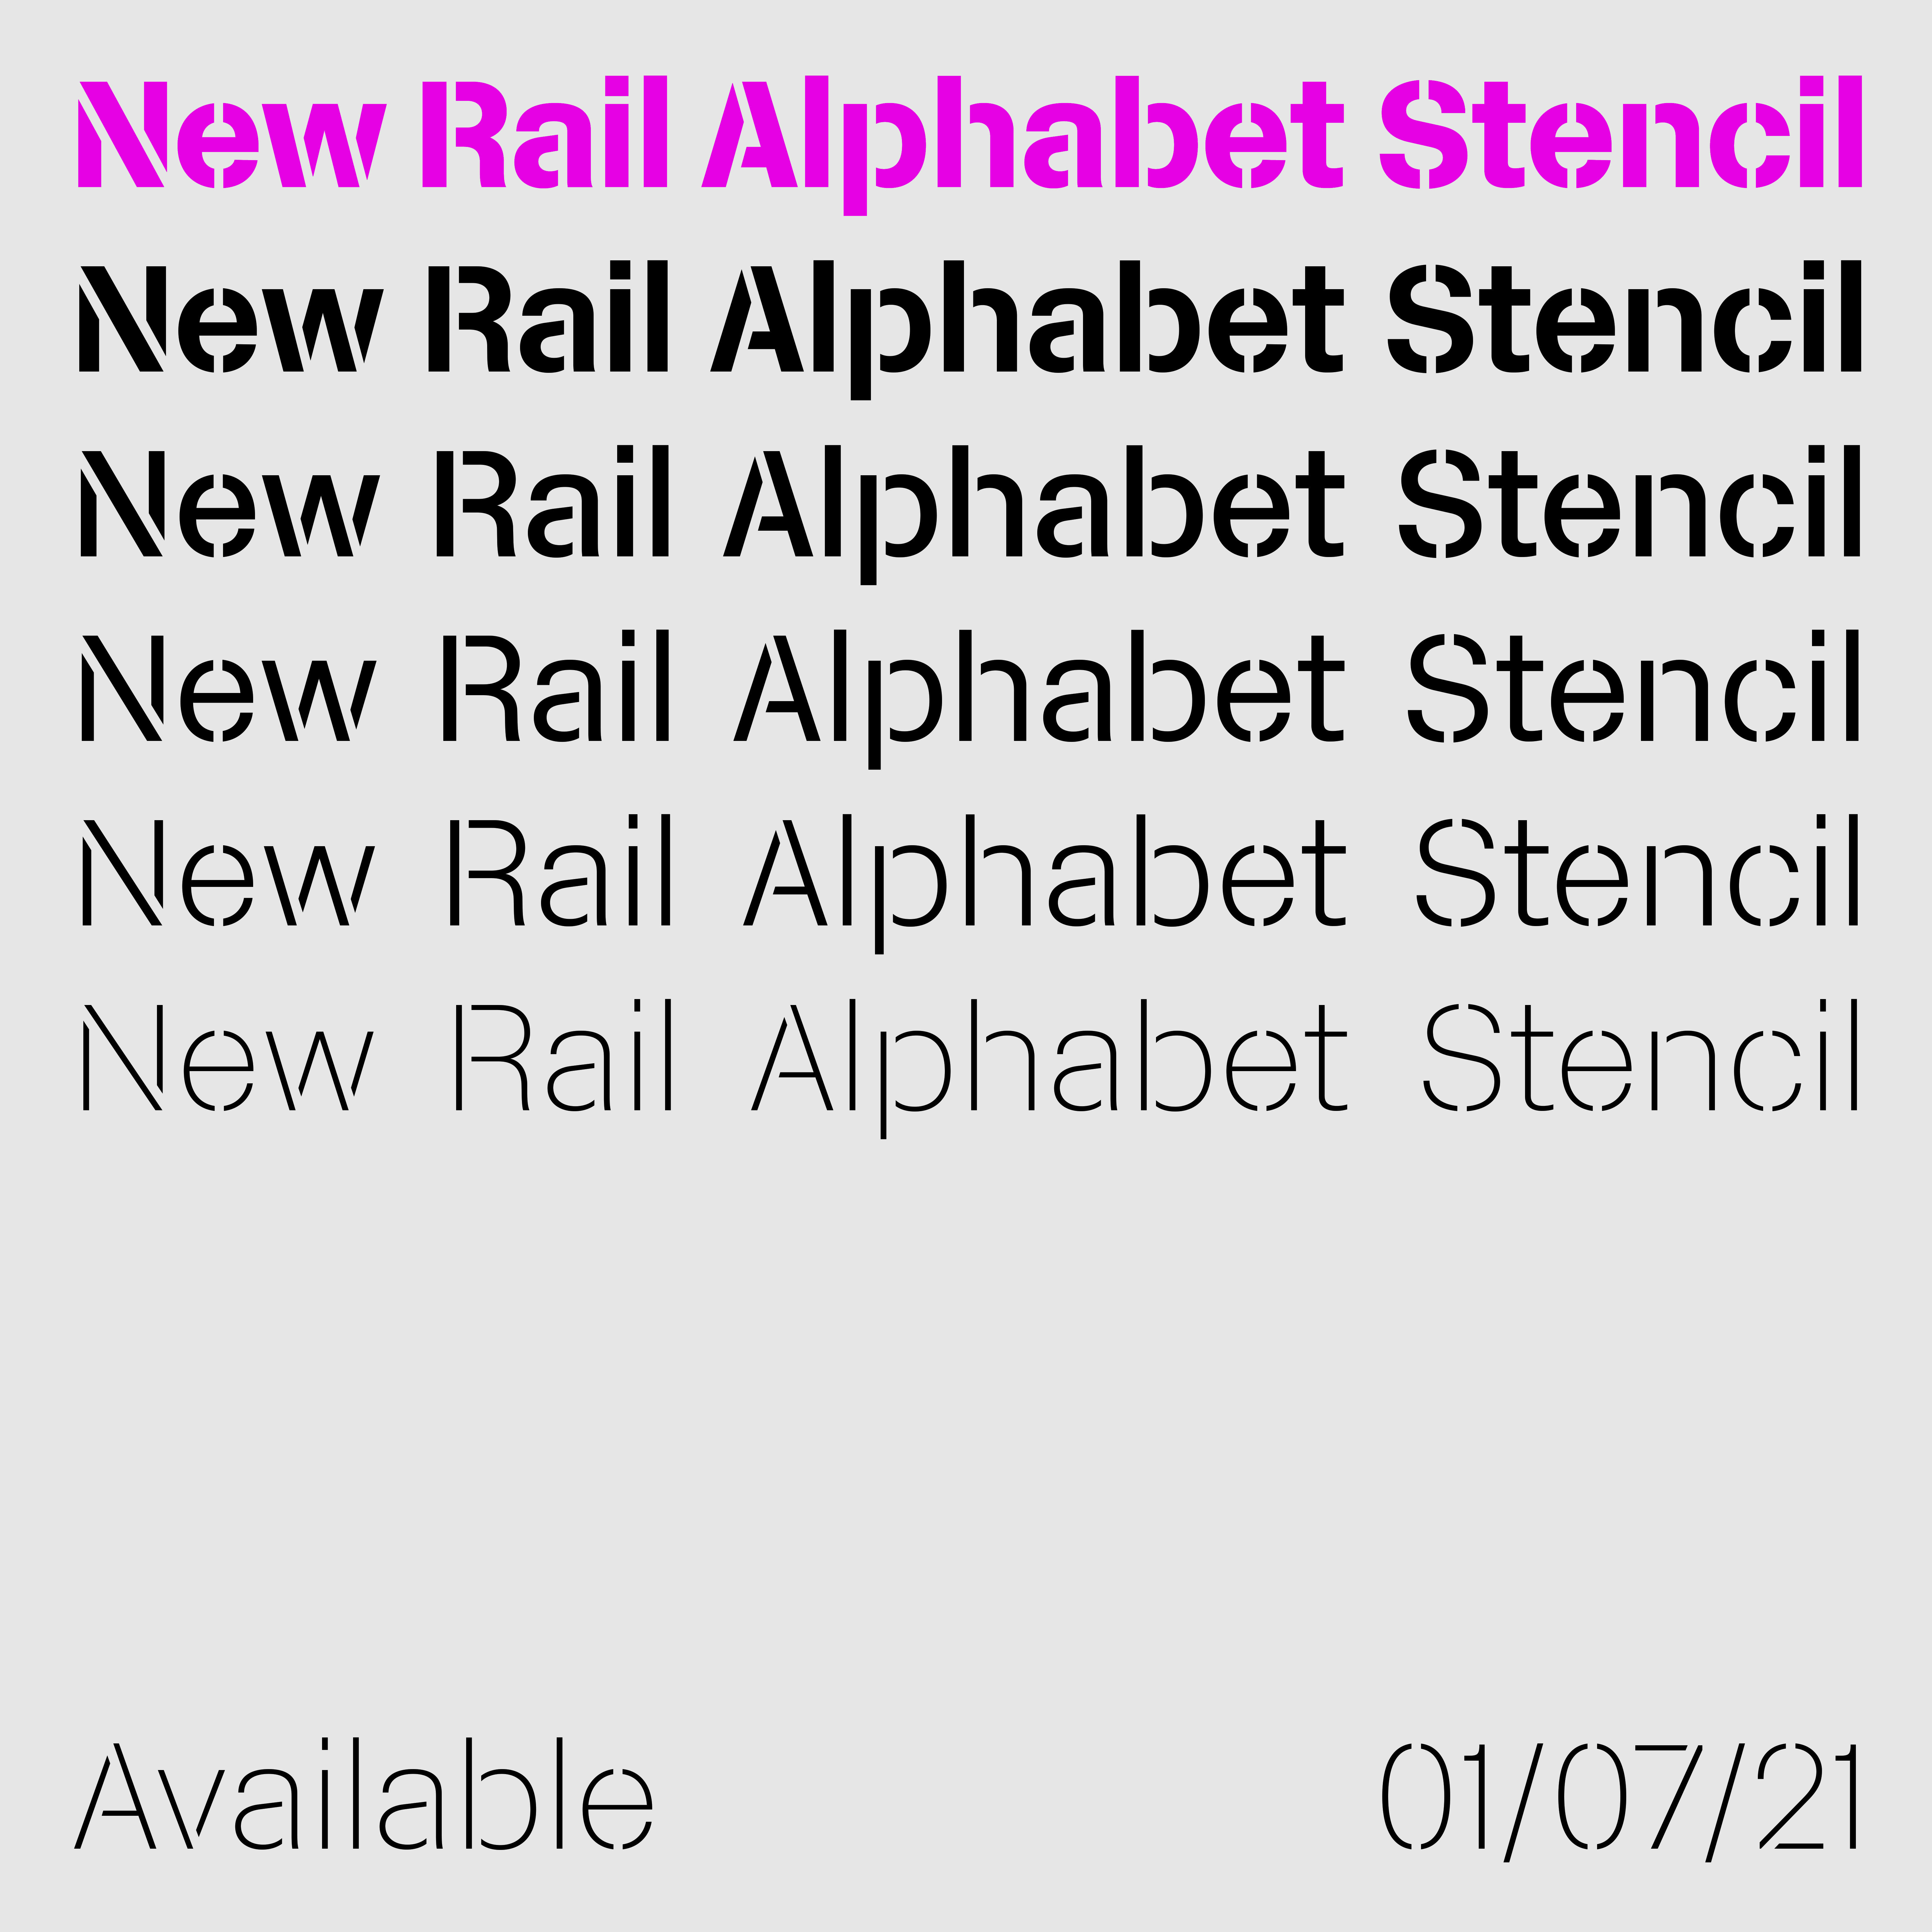 New Rail Alphabet Stencil sample